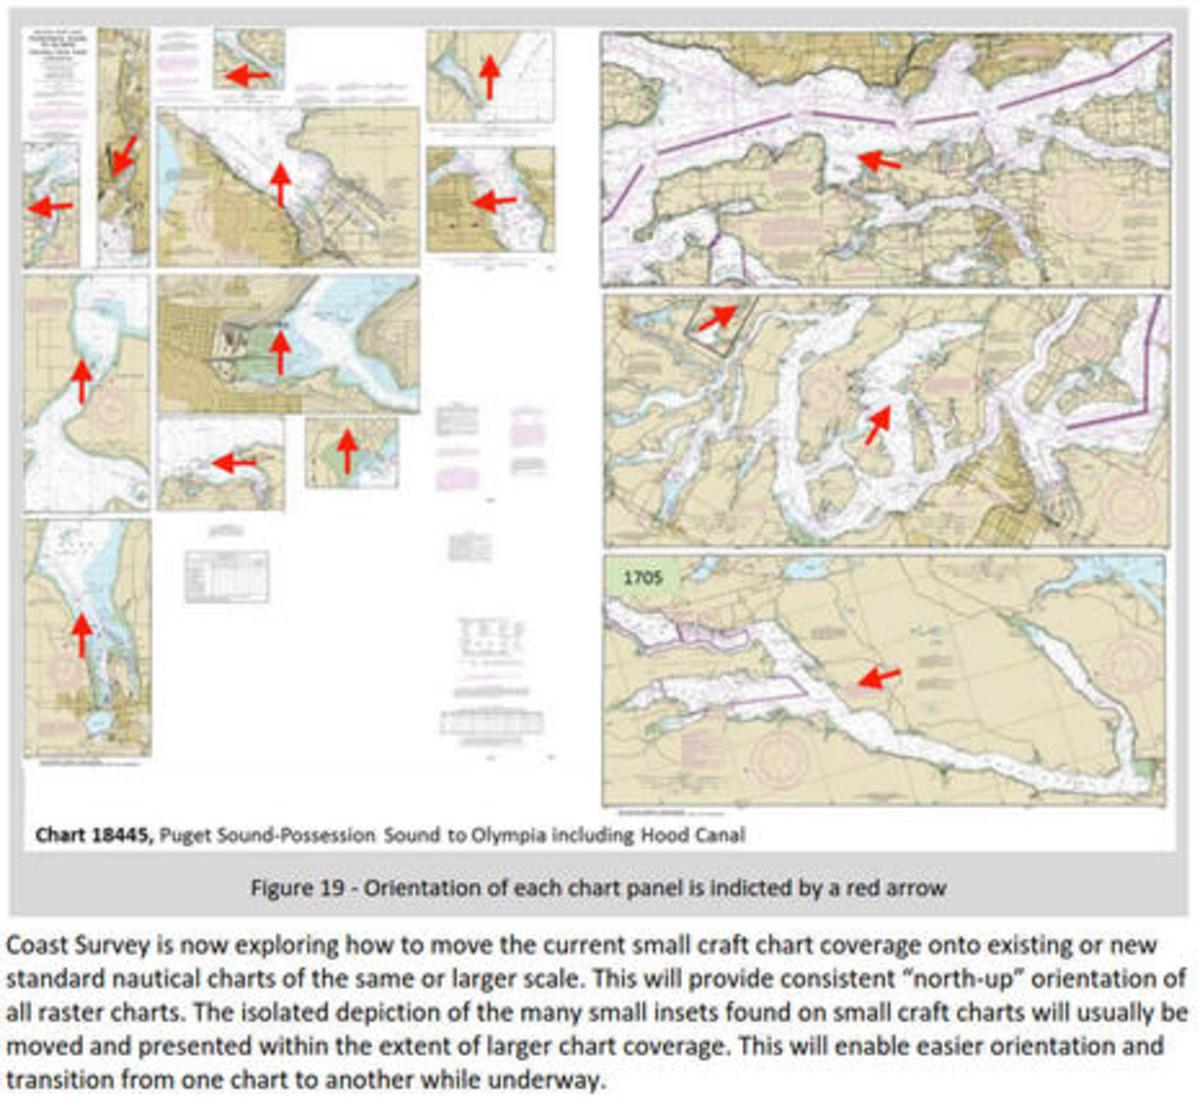 NOAA_National_Charting_Plan_small_craft_update_cPanbo.jpg